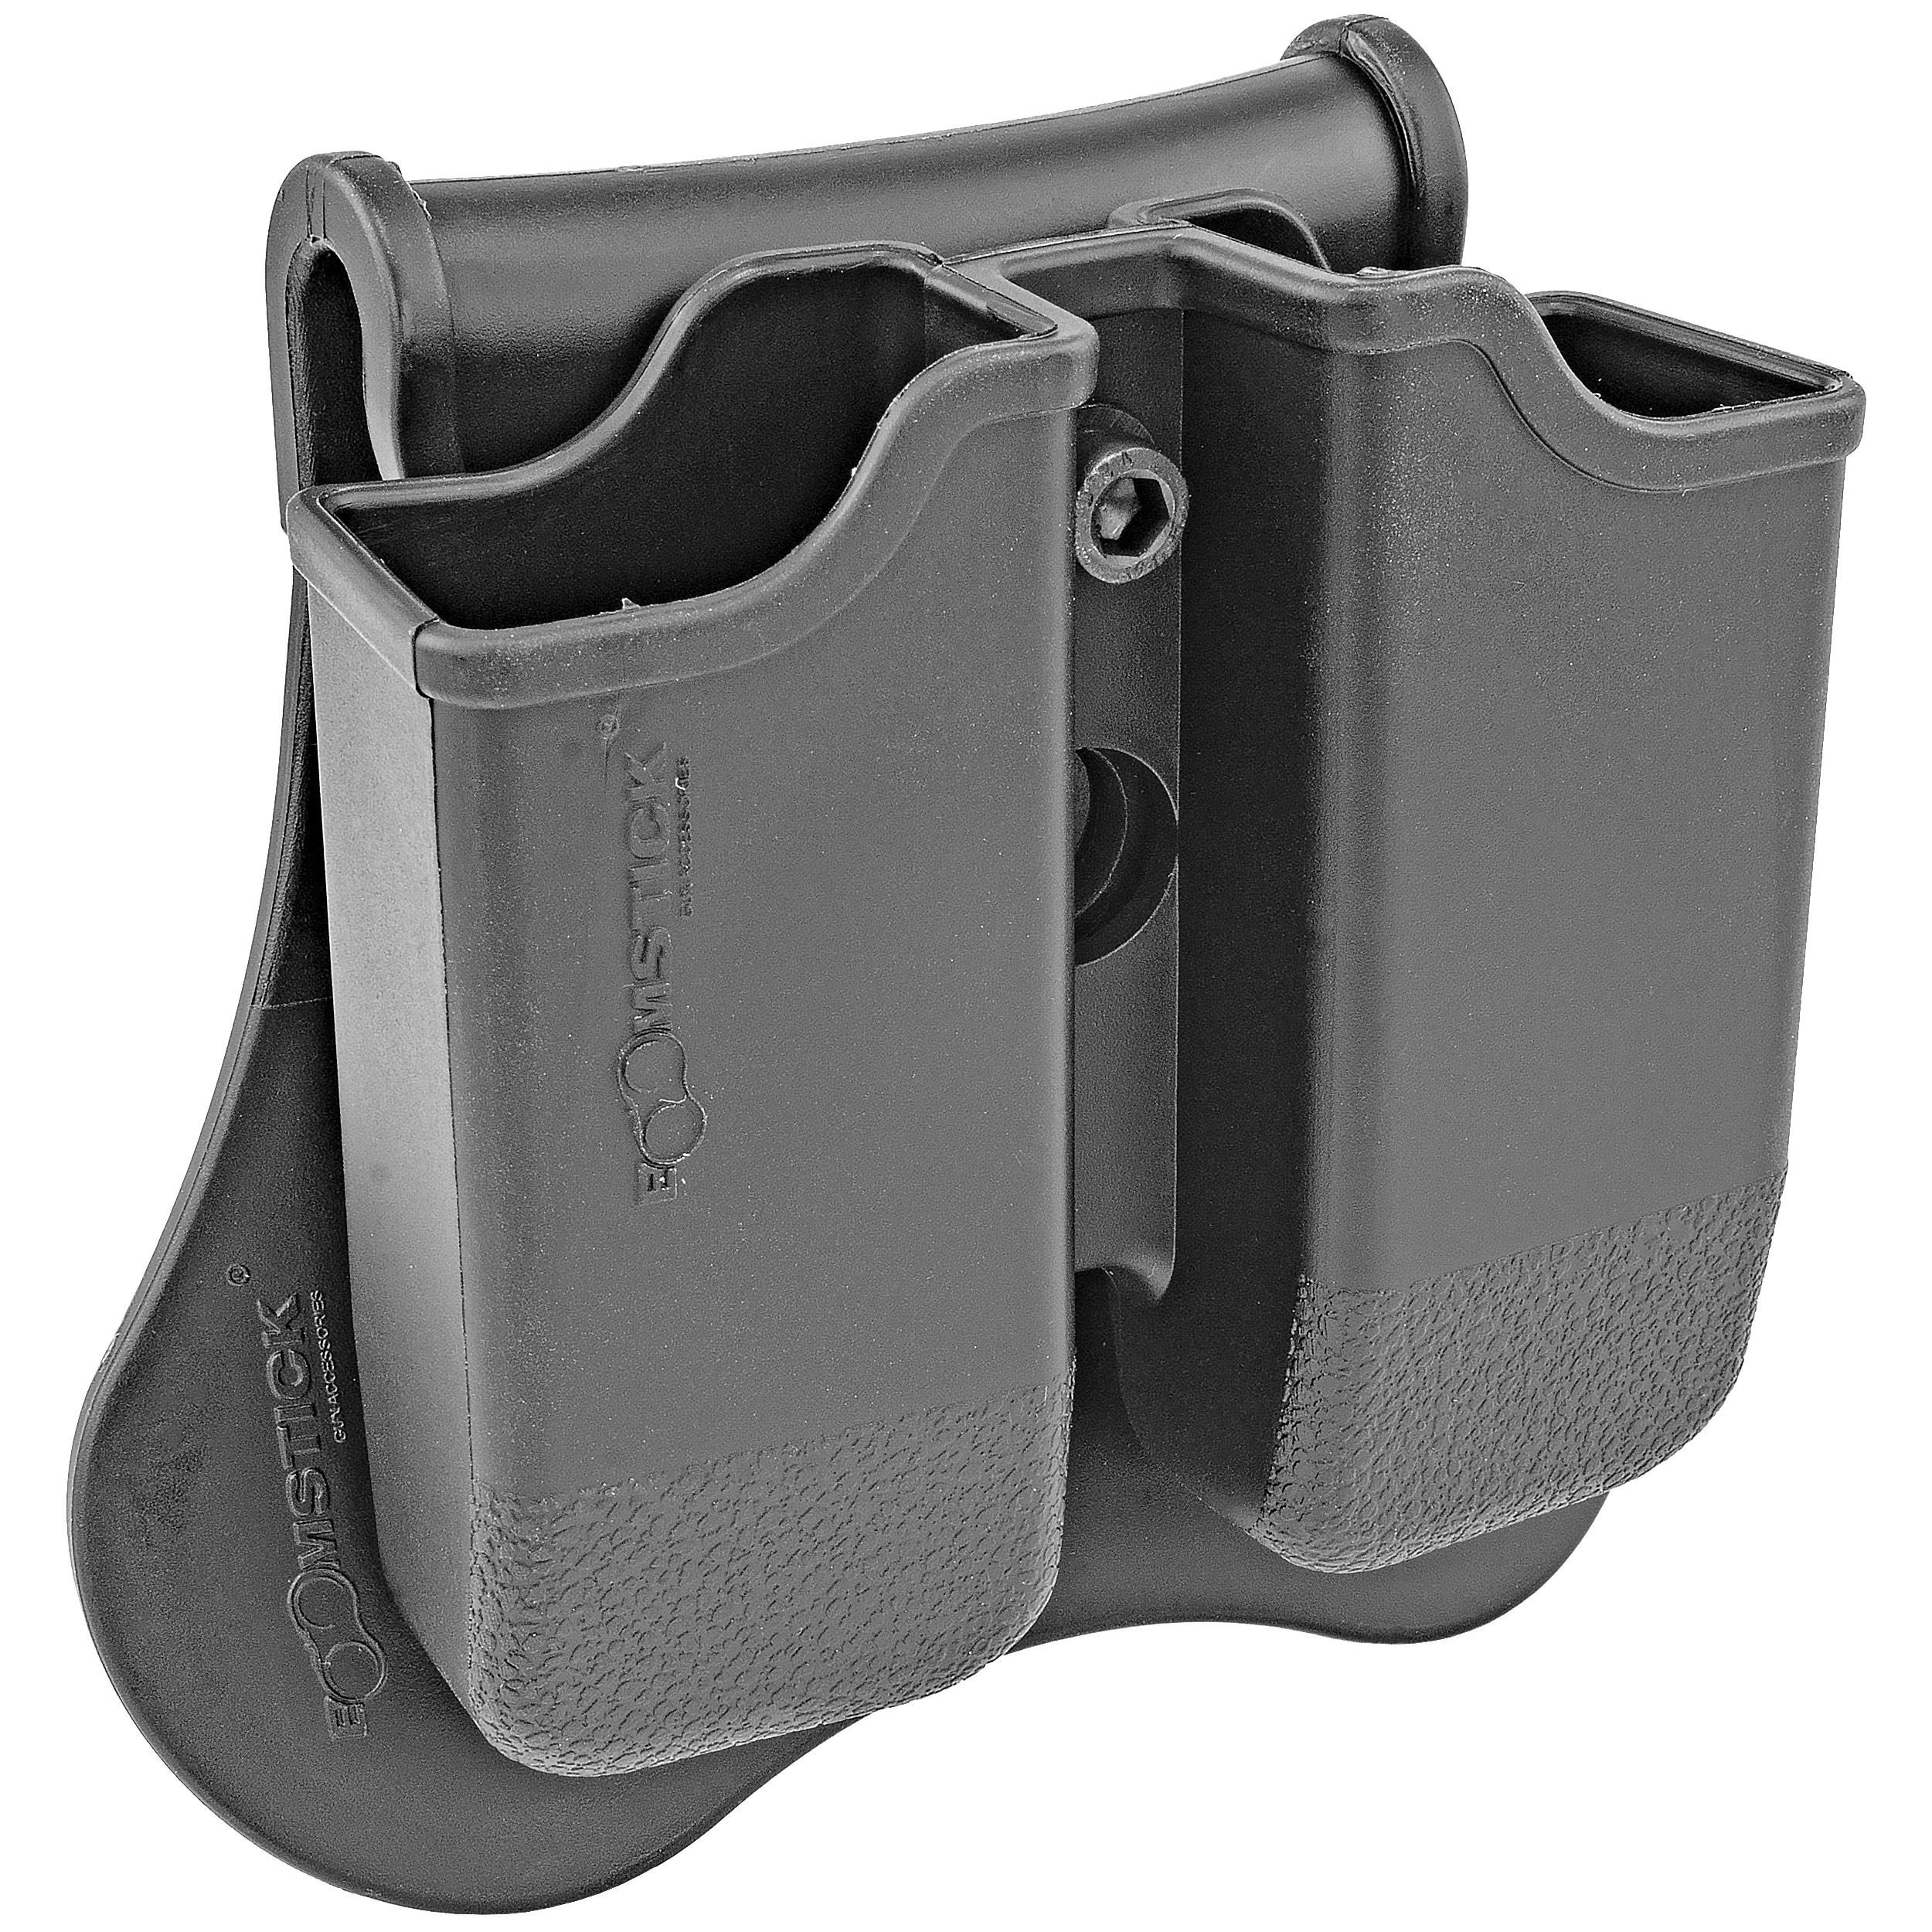 Glock Mag Pouch Dual Swivel